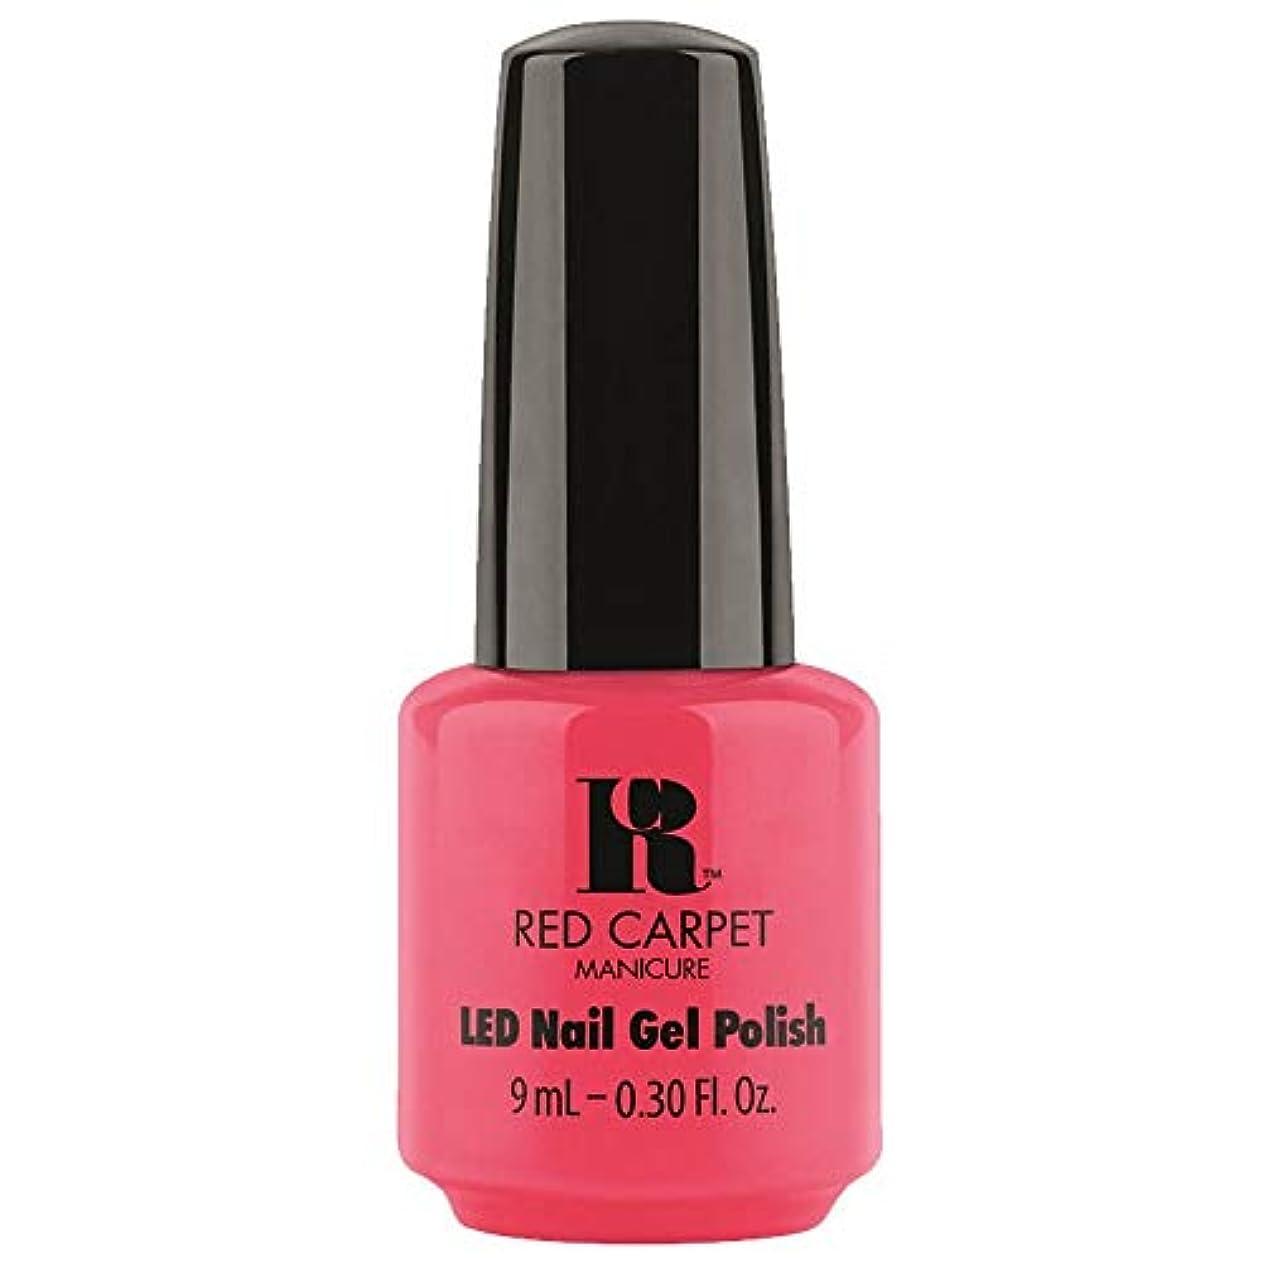 Red Carpet Manicure - LED Nail Gel Polish - Sun Kiss & Tell - 0.3oz / 9ml